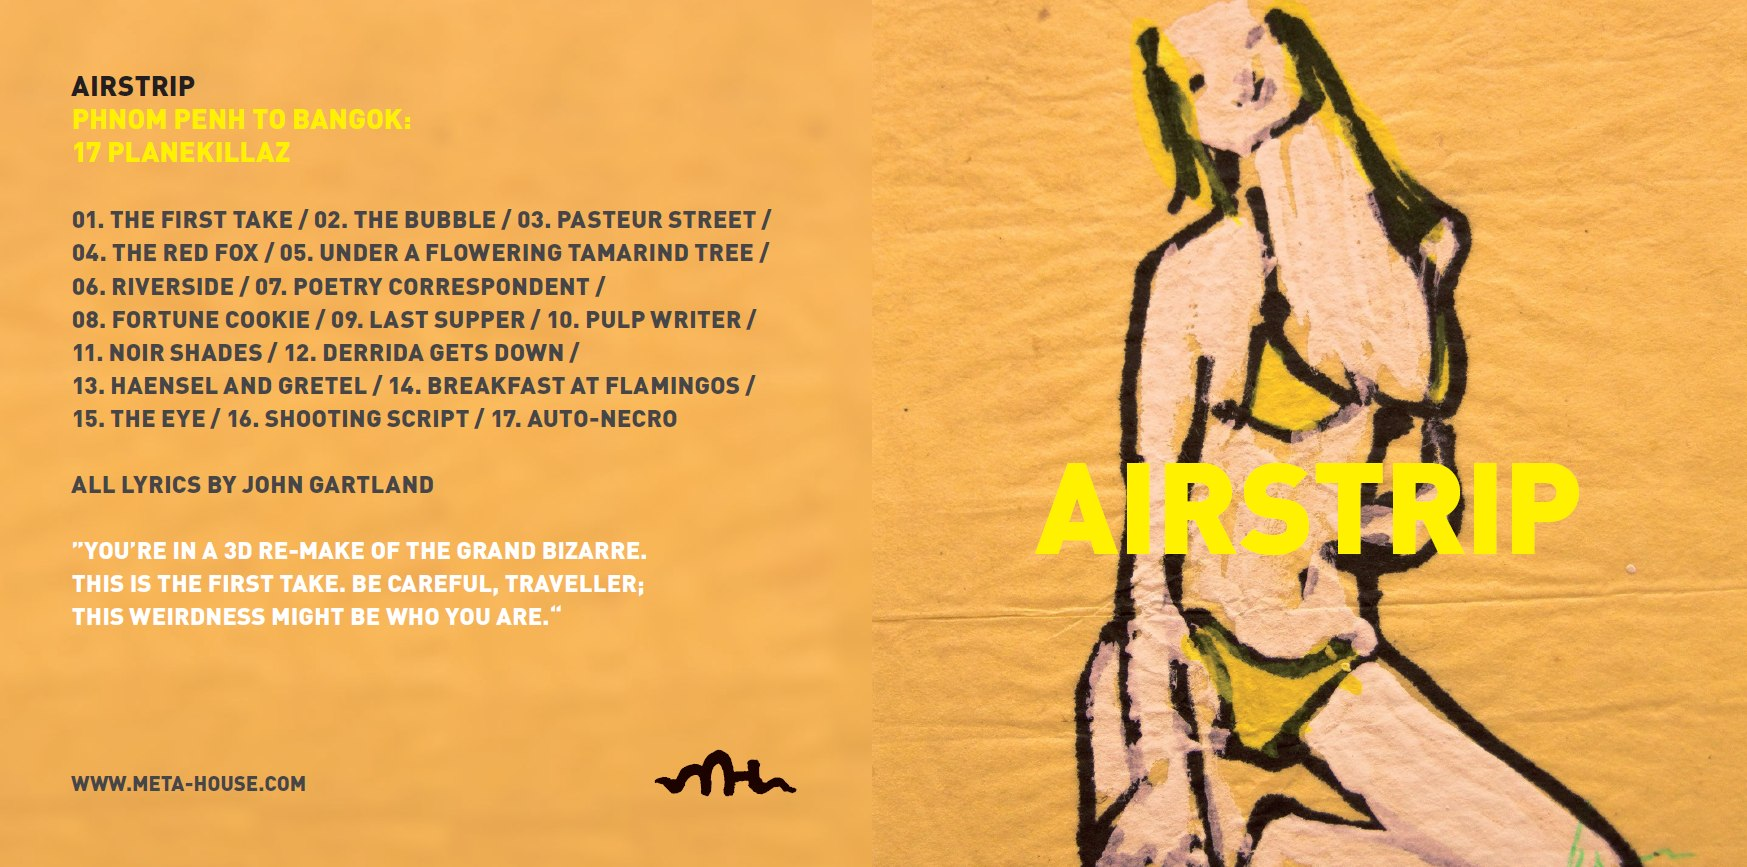 AIRSTRIP 2017-12 Airstrip_Booklet 4s-final-2.pdf